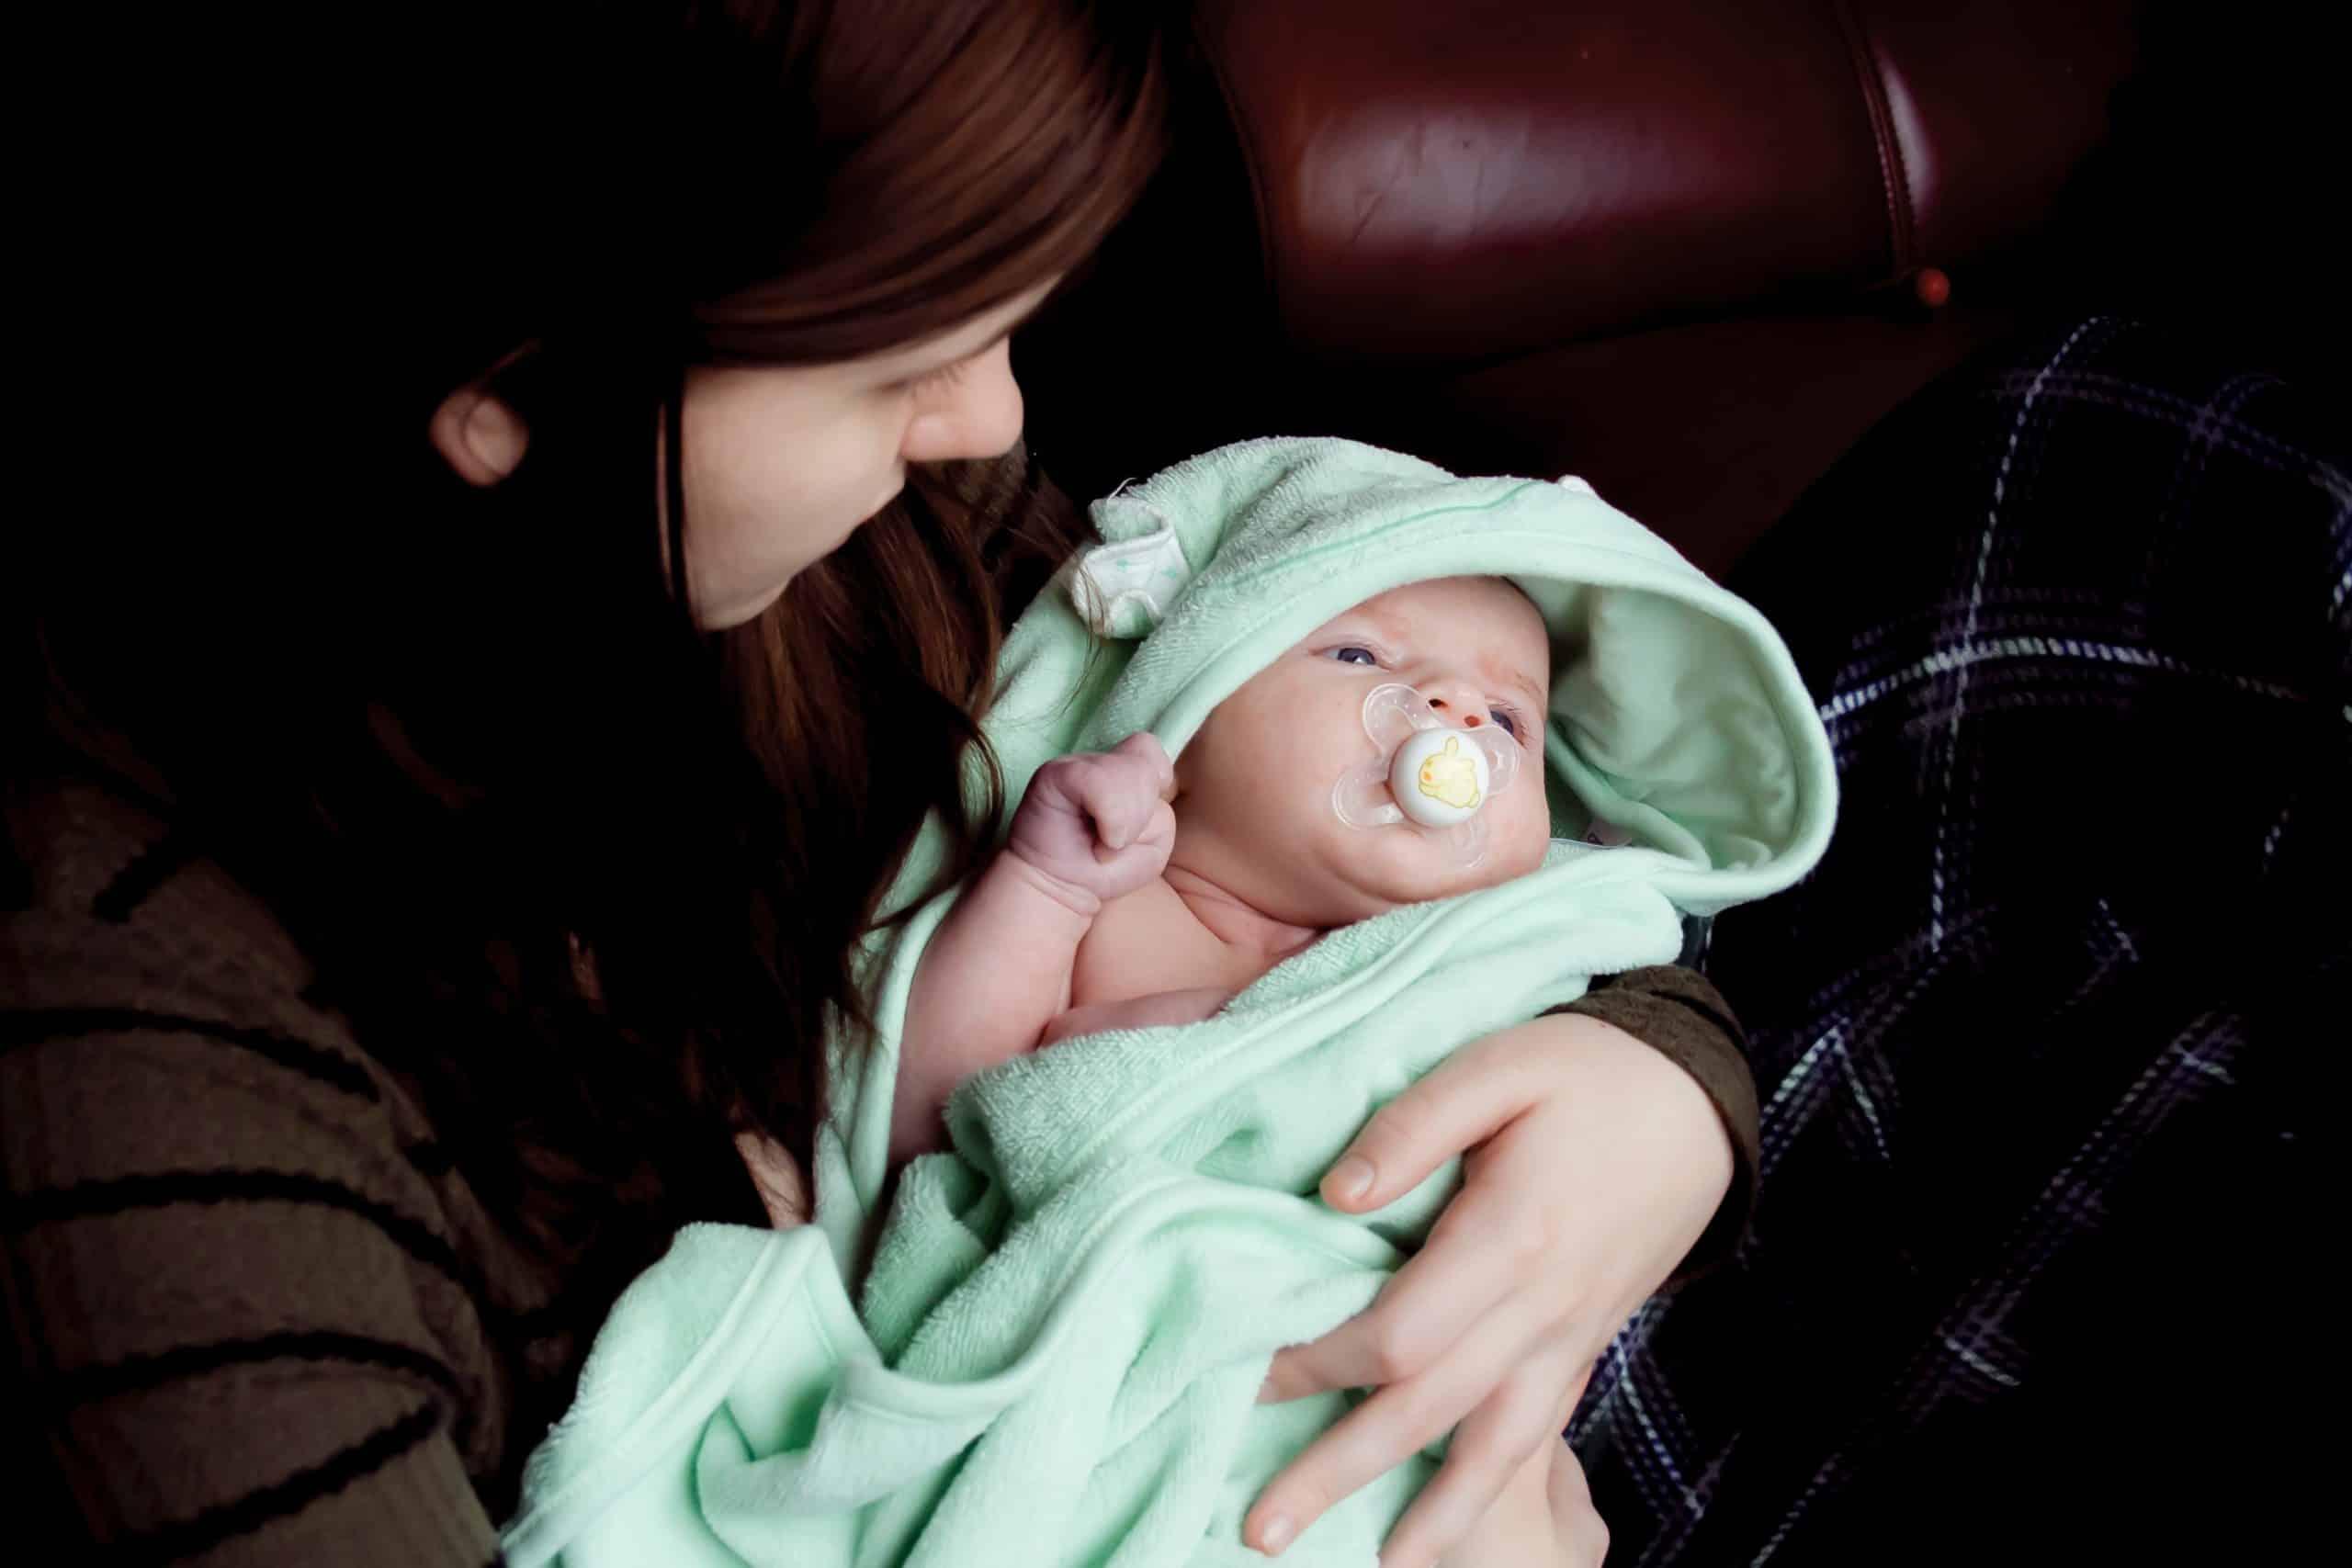 toda grávida já é mãe